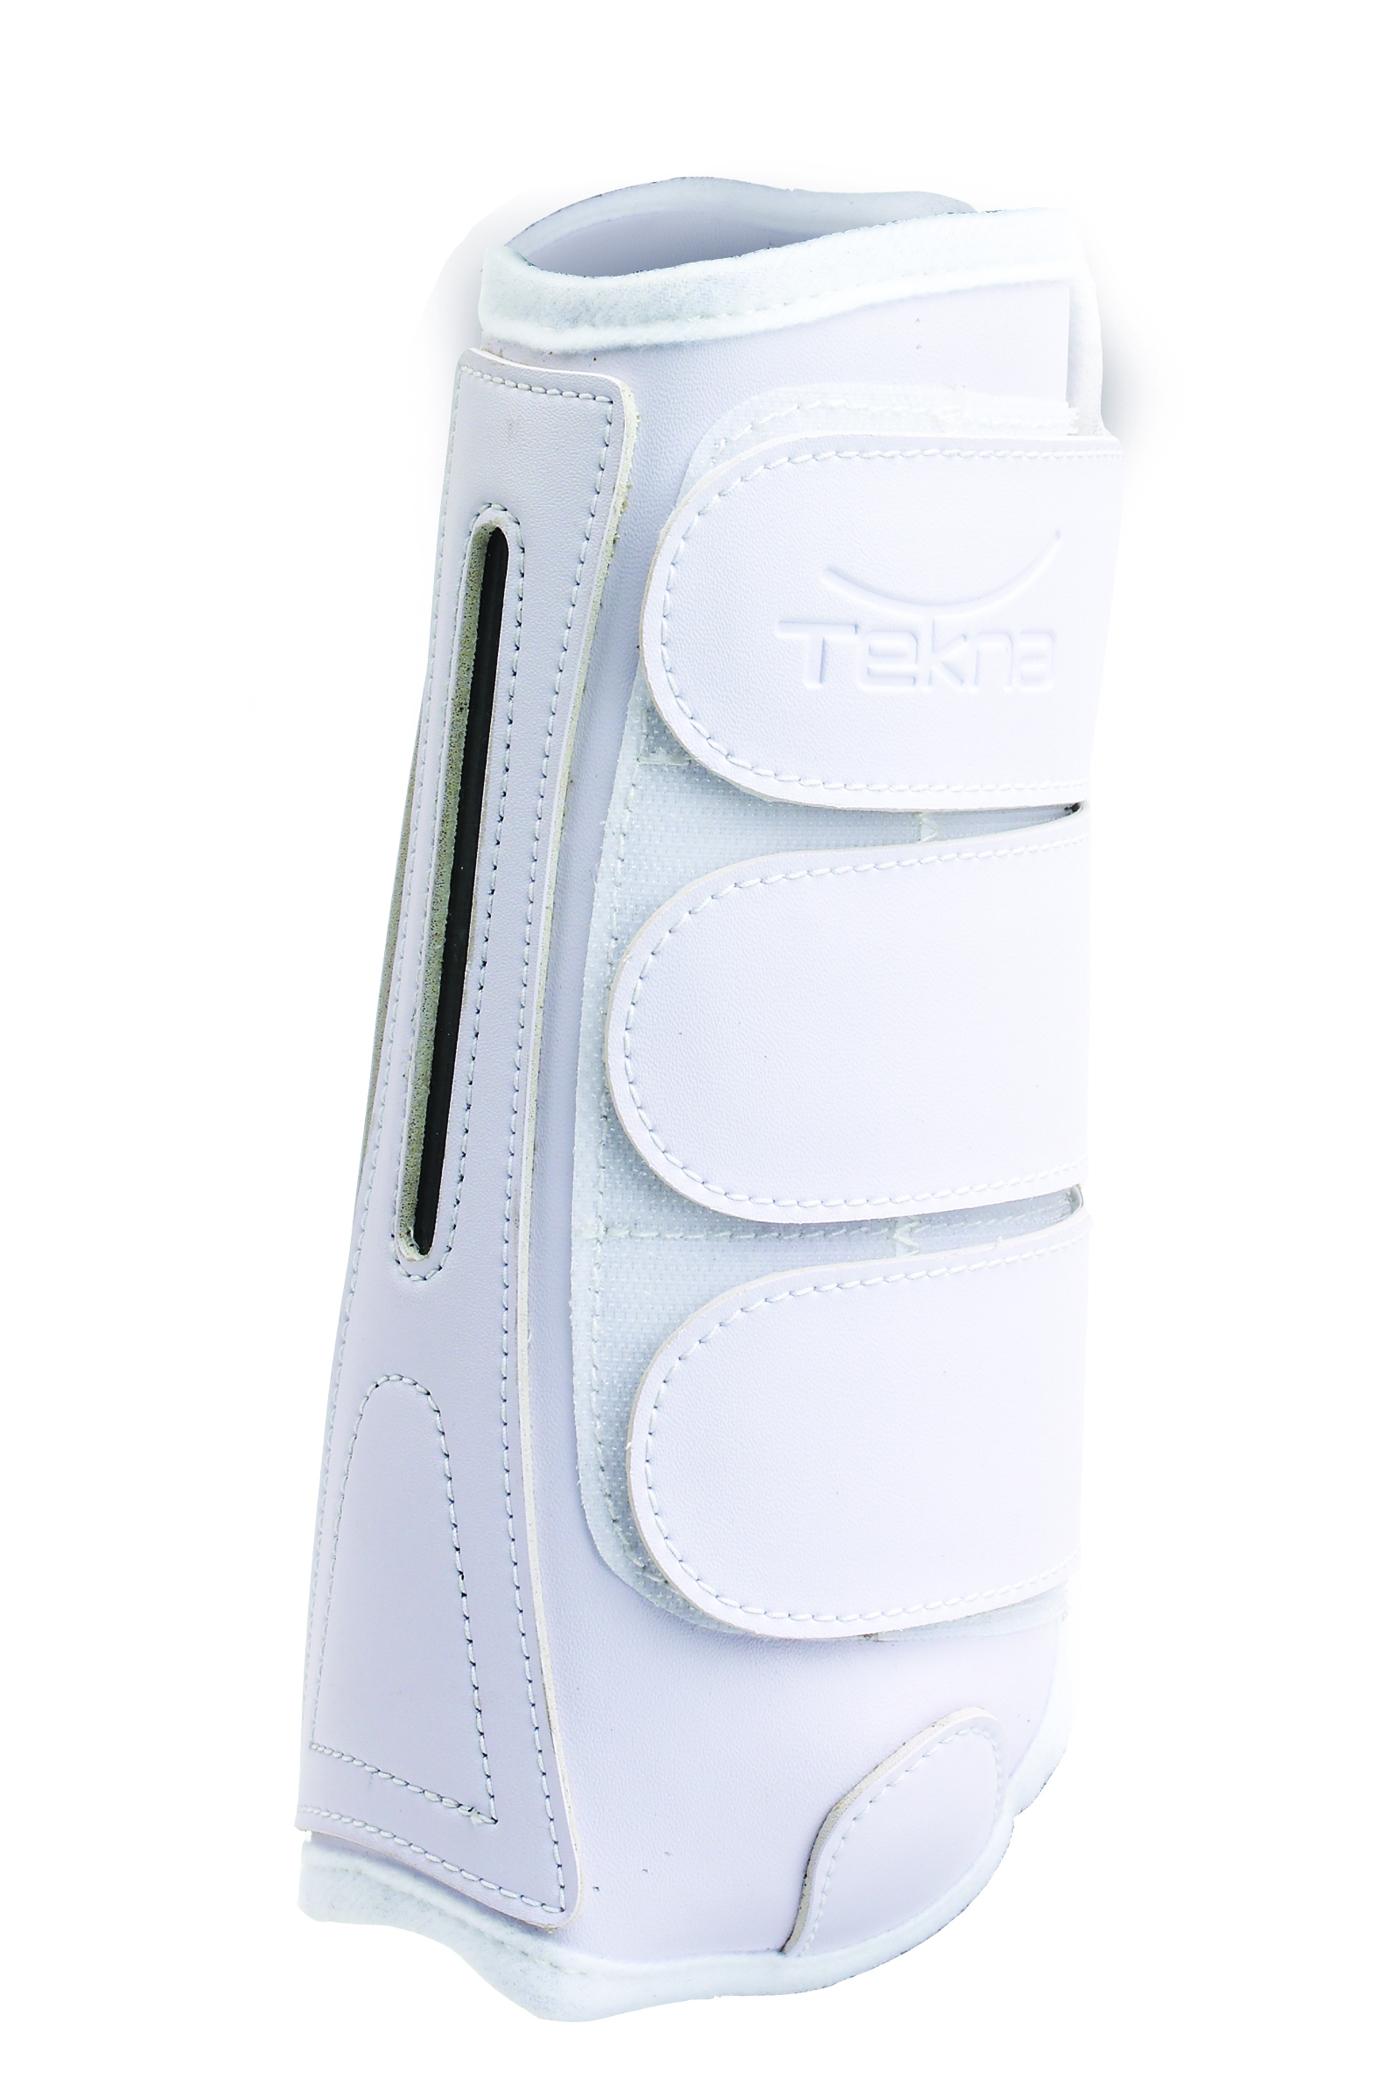 Tekna Dressage Front Boots